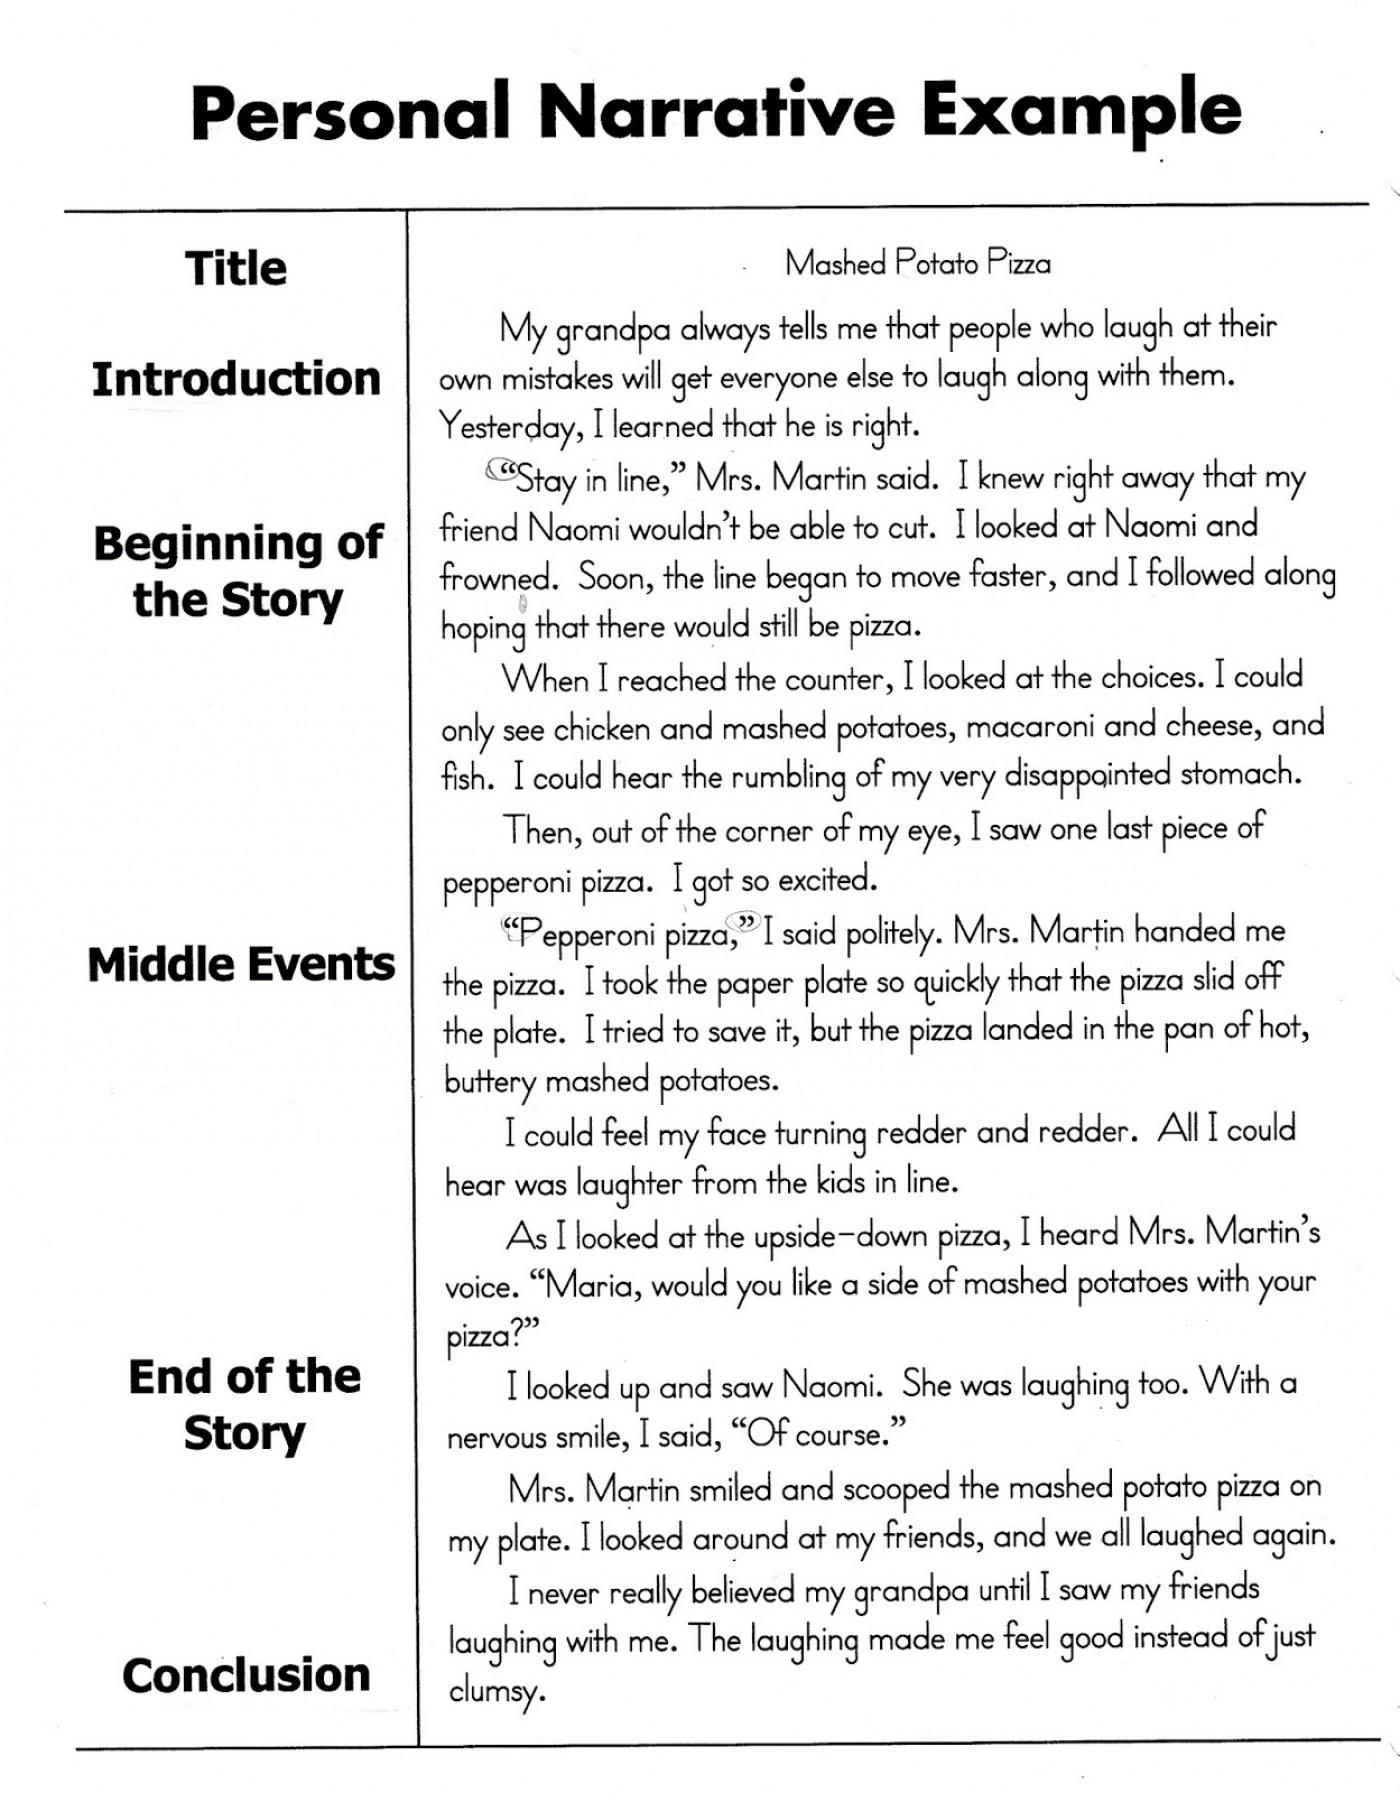 020 8th Grade Essay Topics Example Phenomenal Narrative Us History Questions 1400